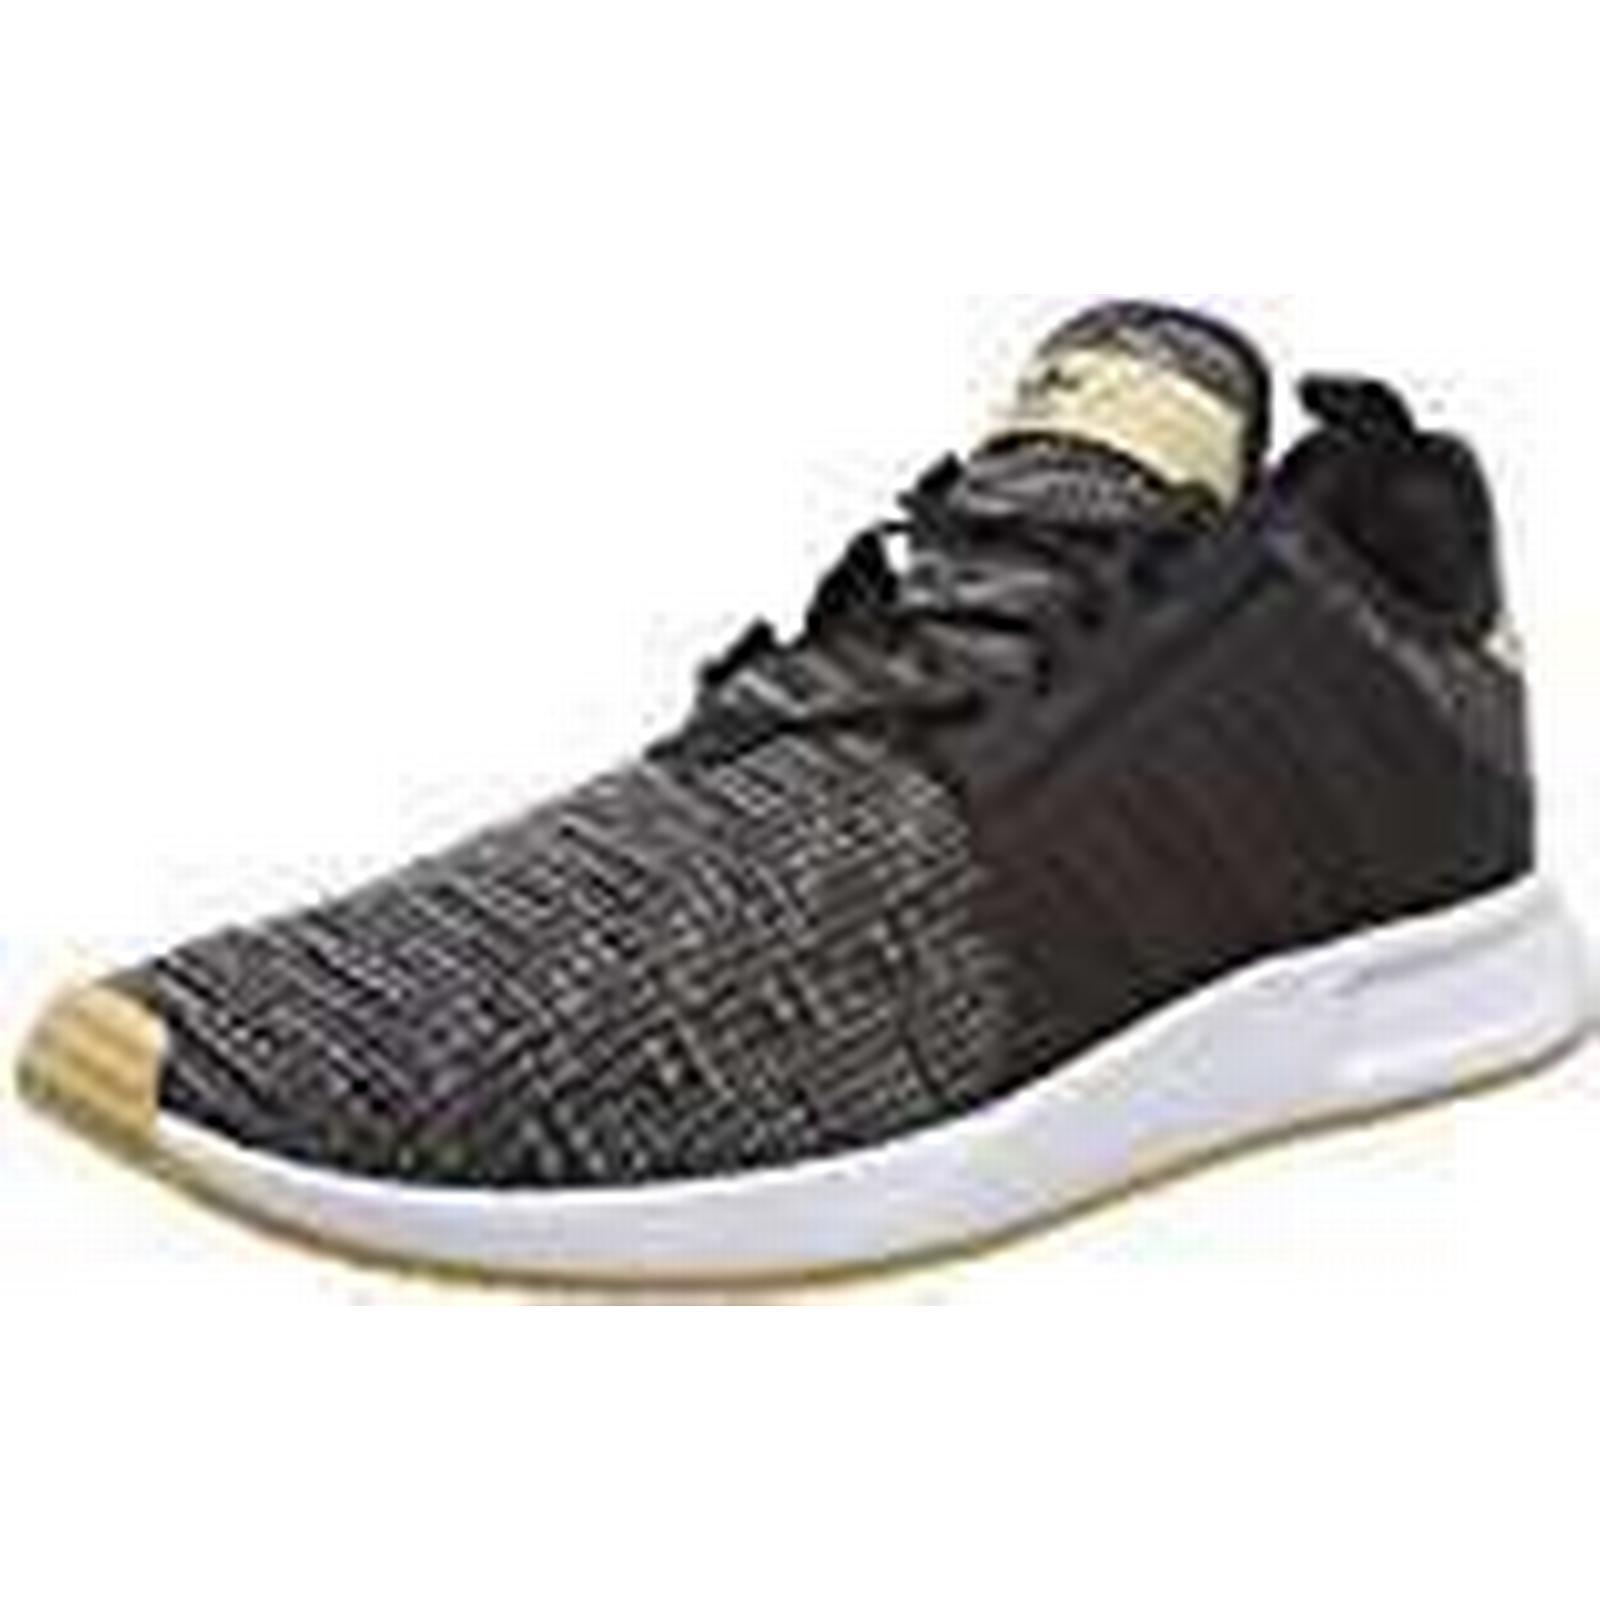 Adidas Black Men''s X_PLR Fitness Shoes, Black Adidas (Negbás / Gum3 000), 12.5 UK 12.5 UK 9dd088